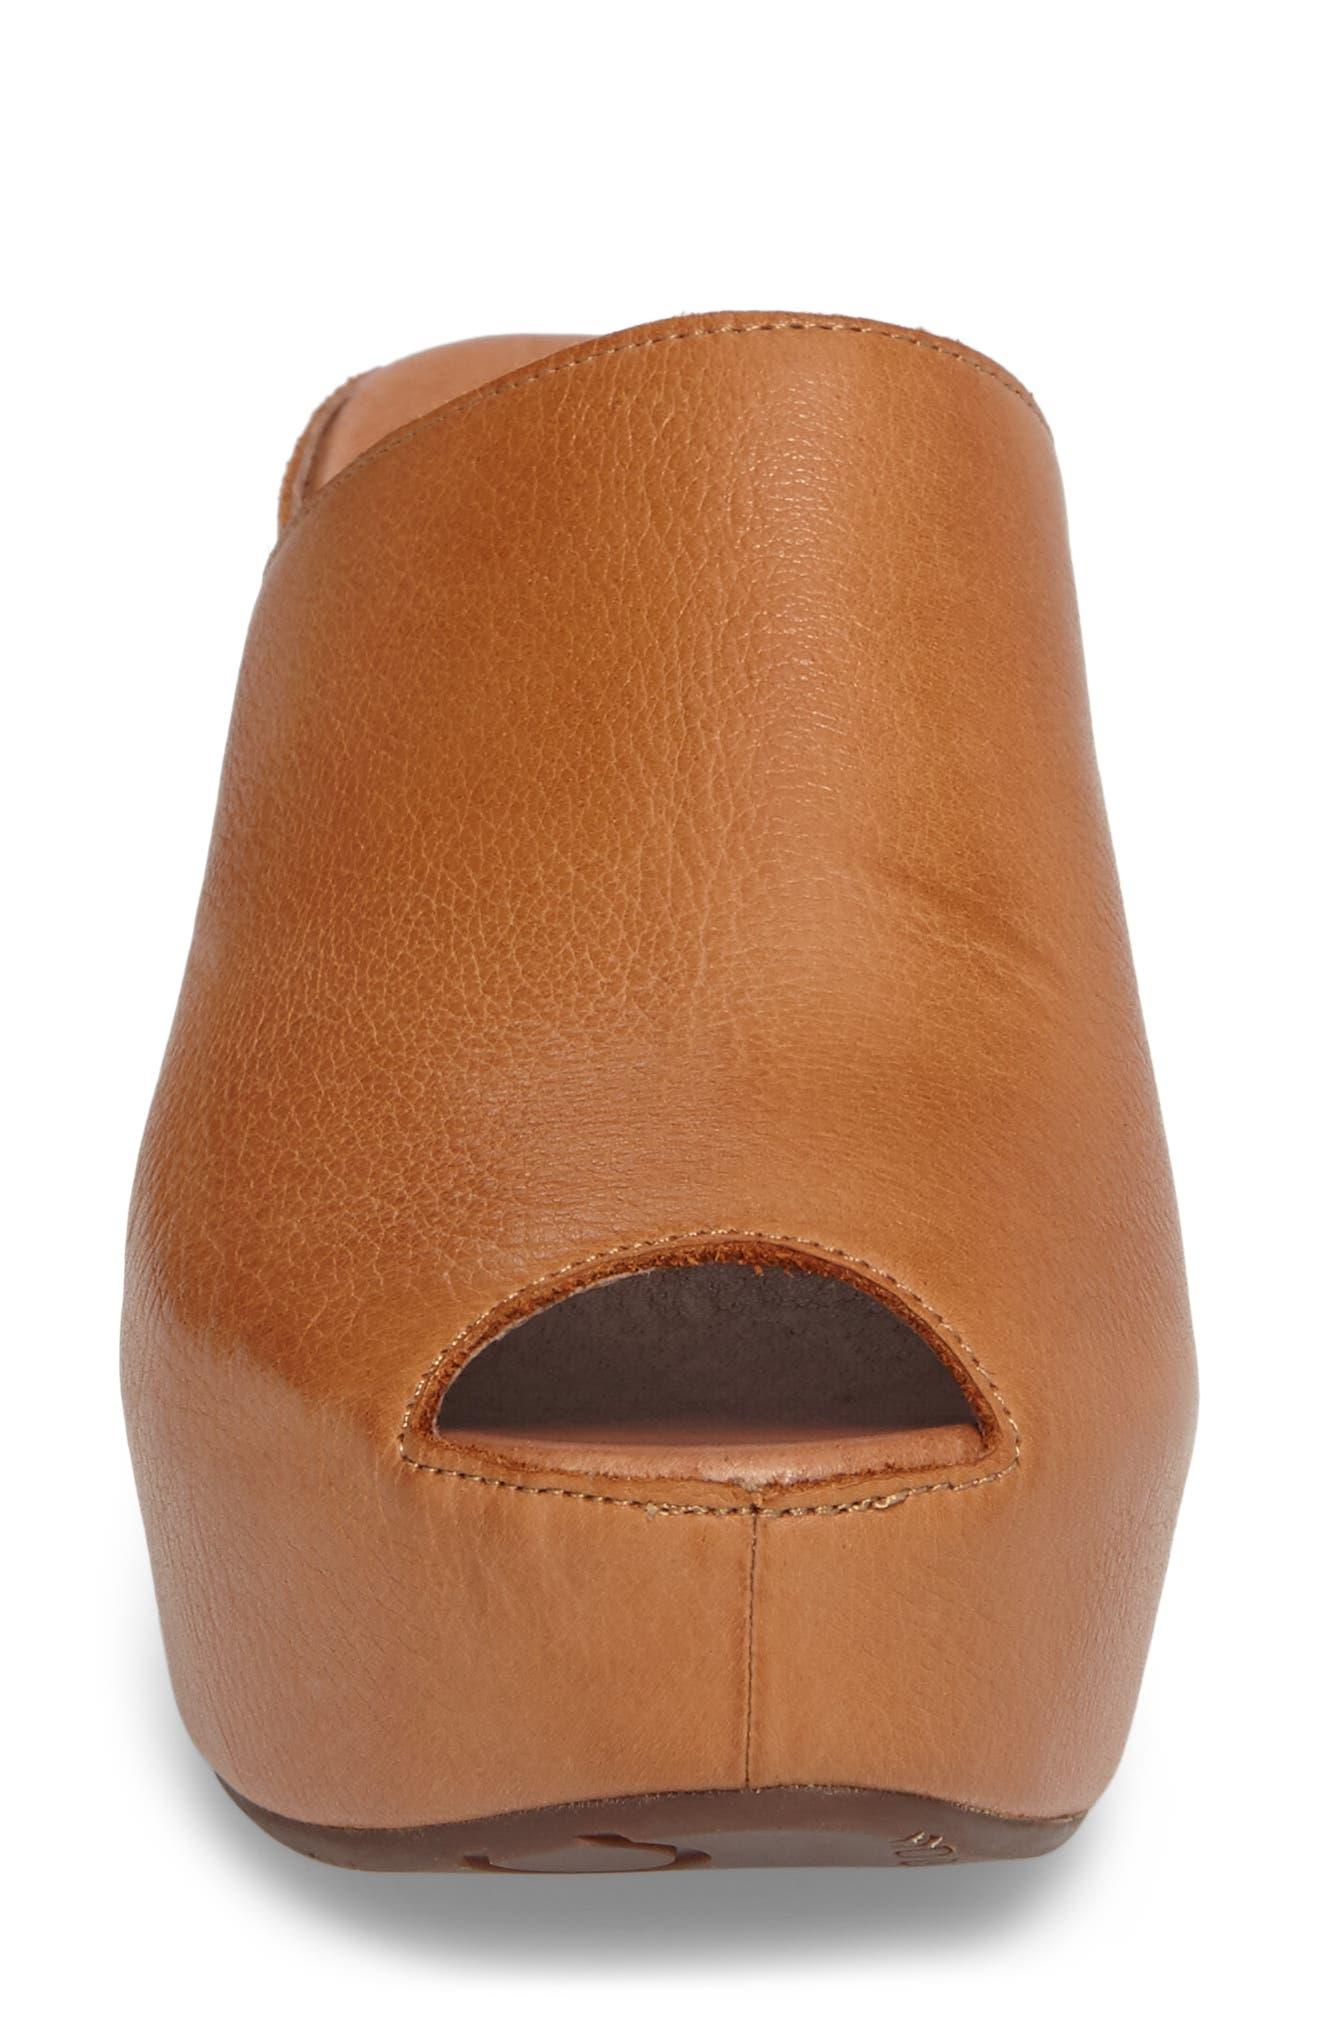 Willa Platform Wedge Mule,                             Alternate thumbnail 4, color,                             Camel Leather